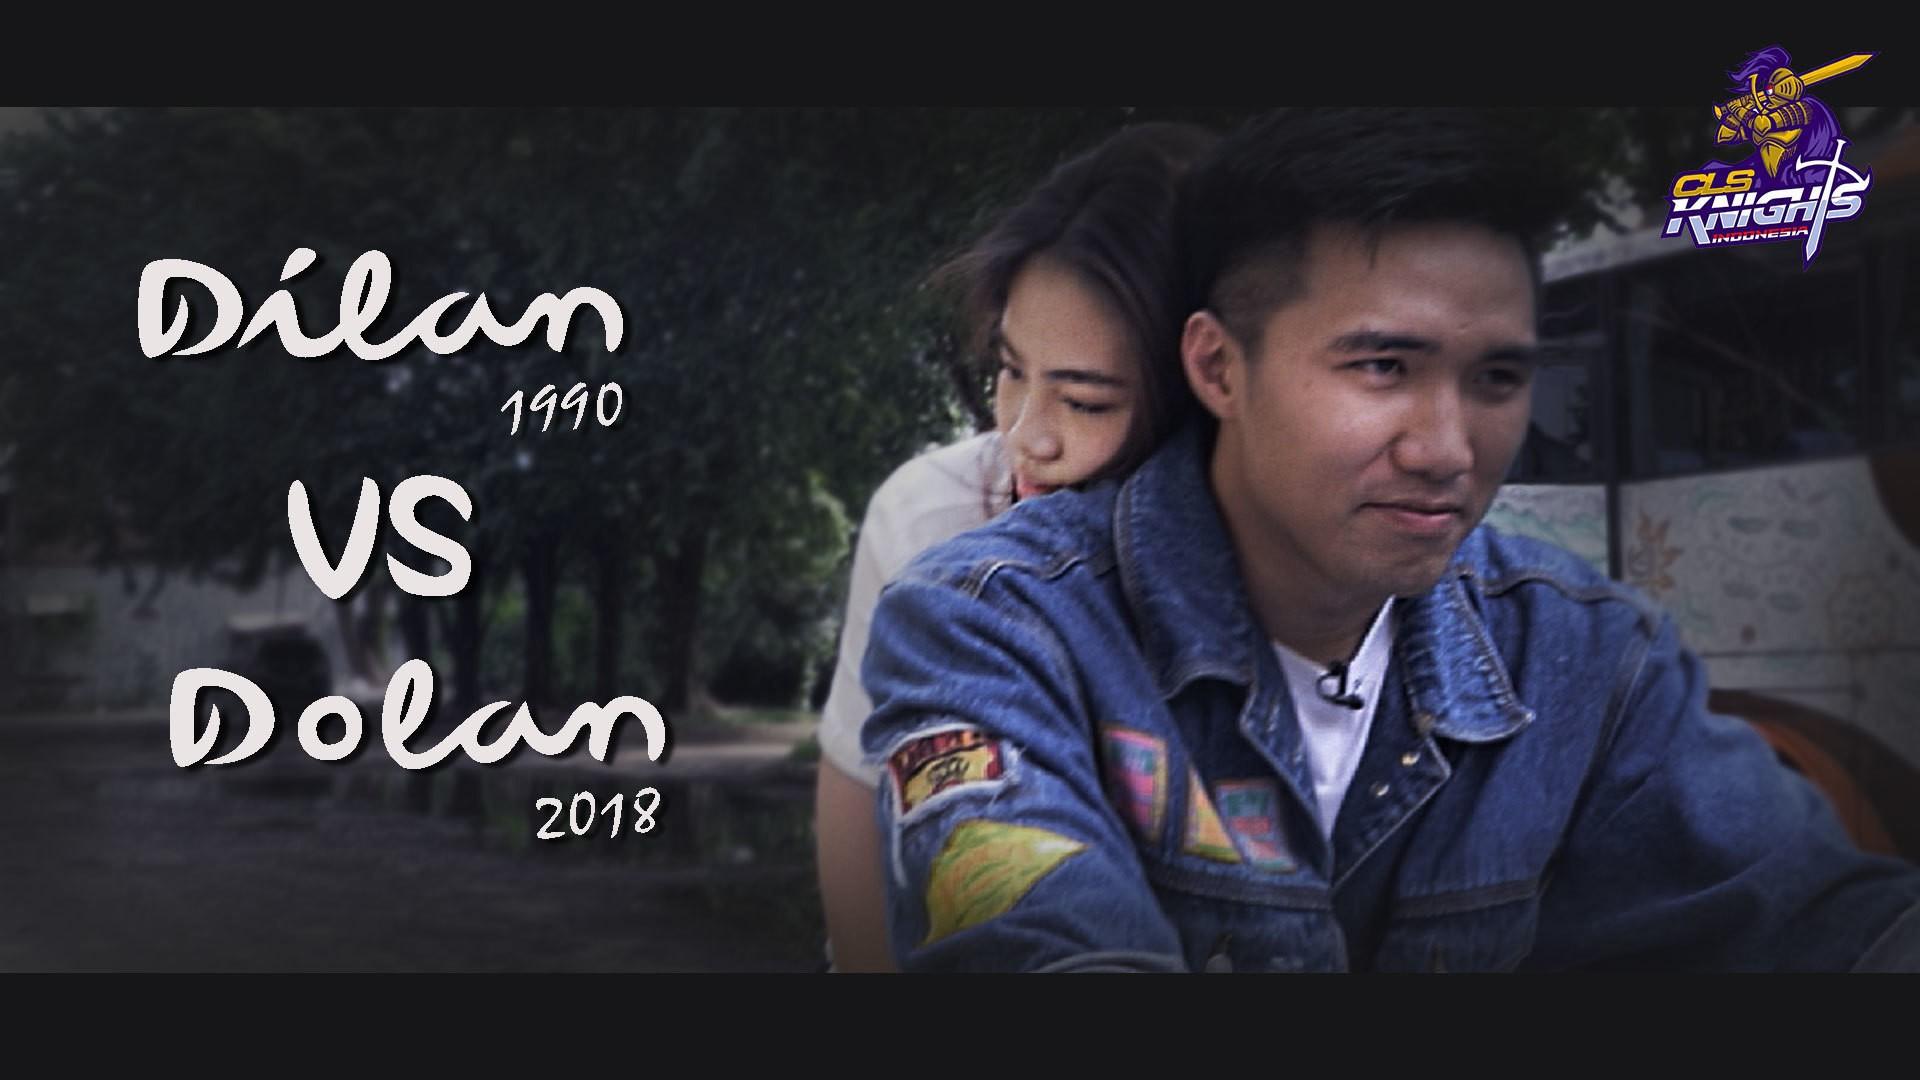 Dilan 1990 Vs Dolan 2018